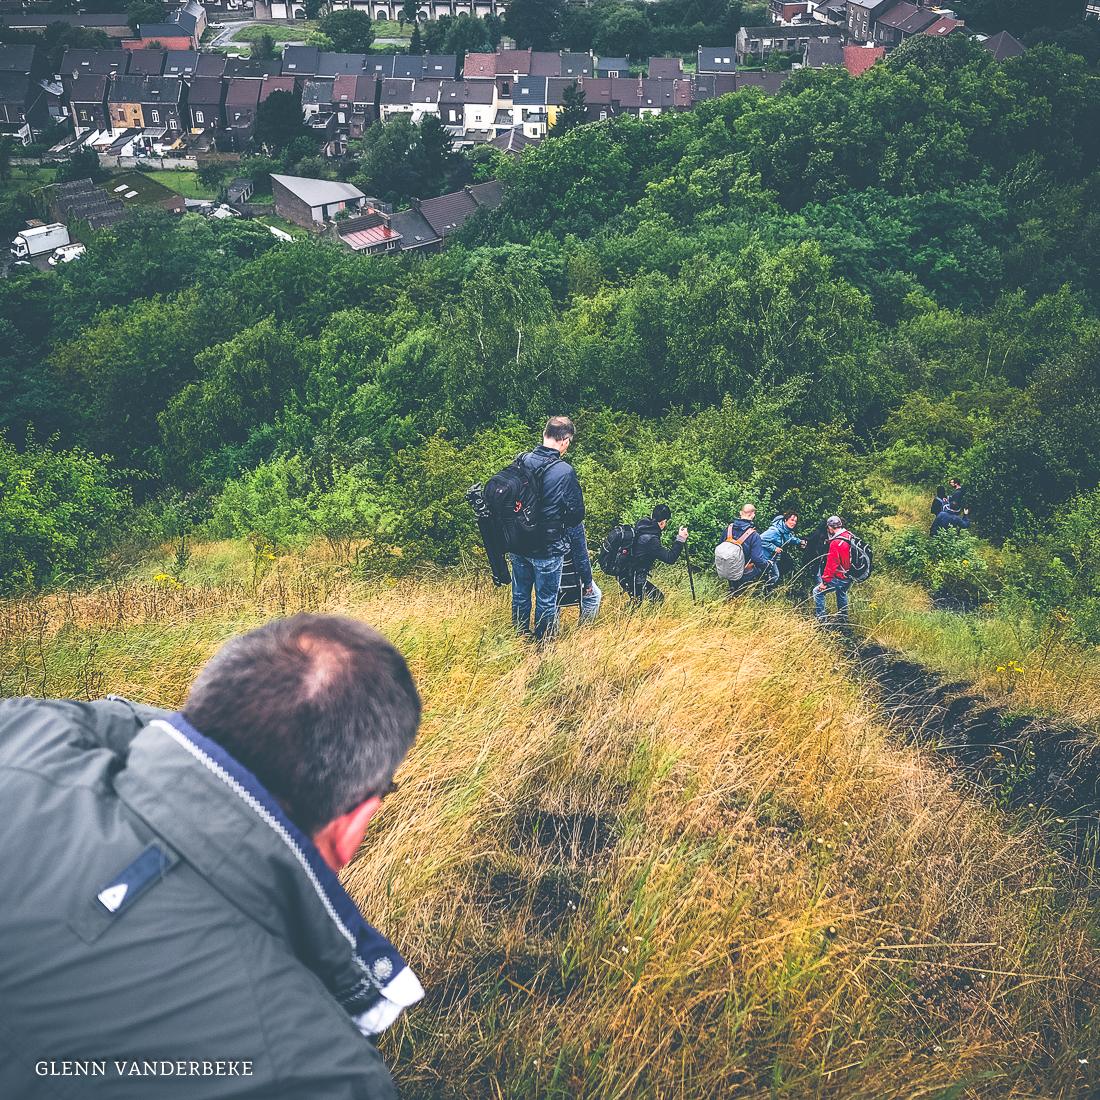 glenn vanderbeke, Landschap, cityscape, charleroi, stadsfotografie, stadssafari, charleroi adventure, landschapsfotografie, landschapsfotograaf